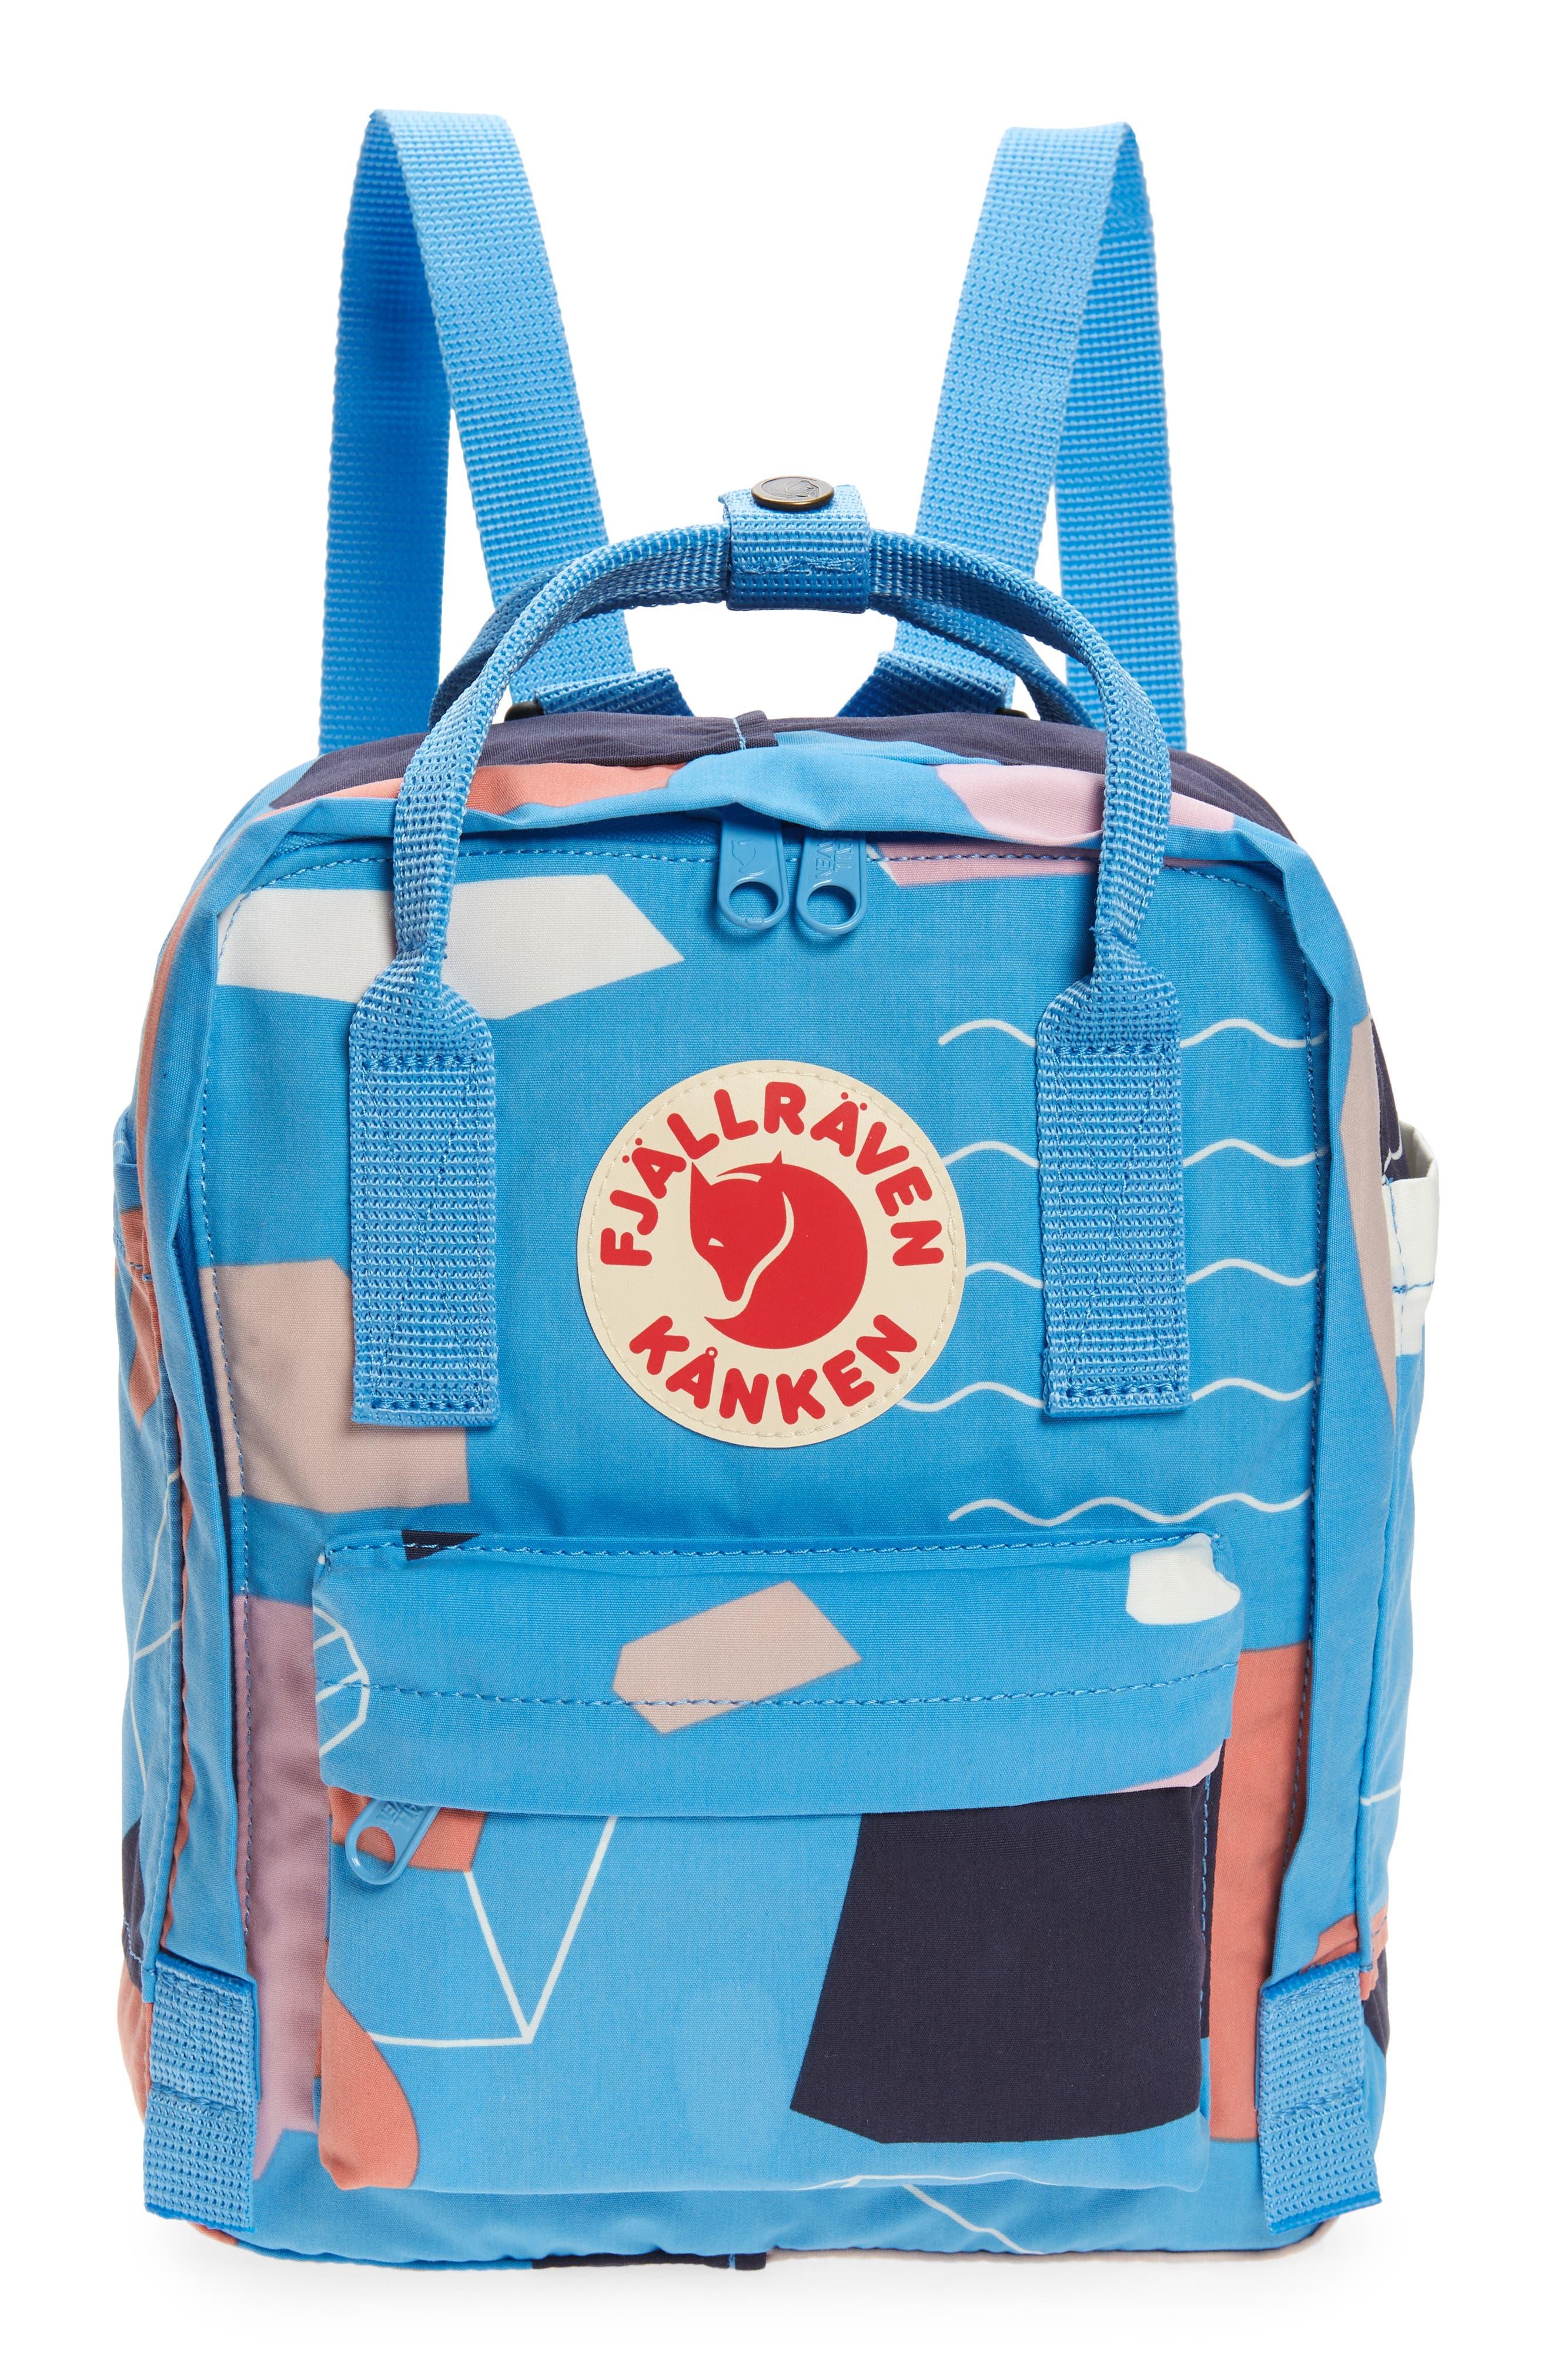 Kanken Art Water Resistant Mini Backpack